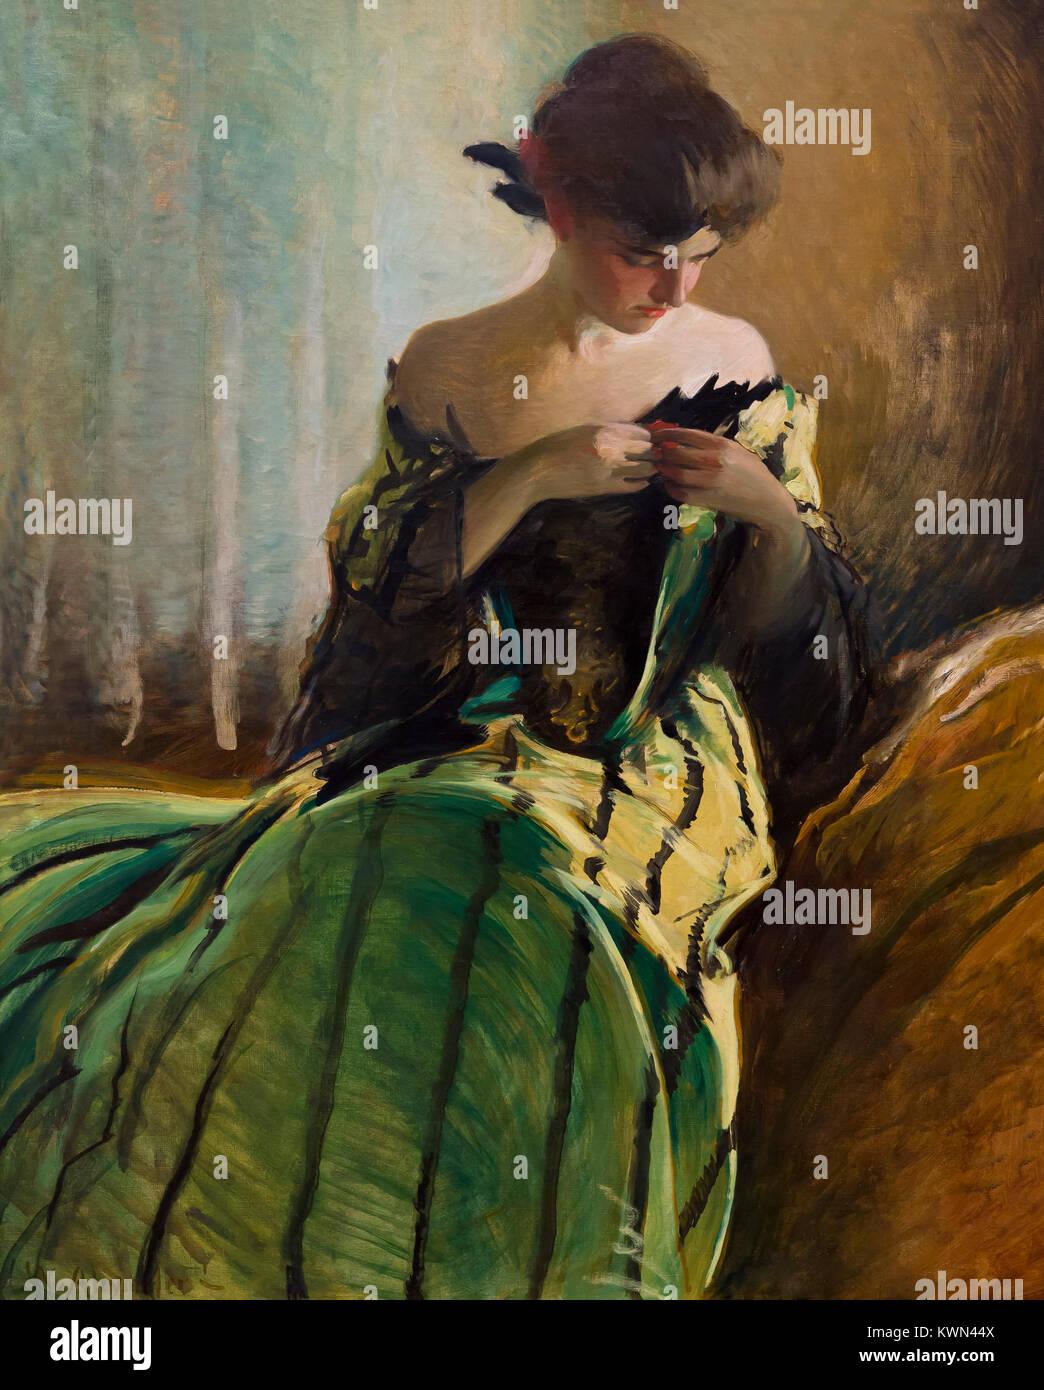 Study in Black and Green, John White Alexander, 1906, Metropolitan Museum of Art, Manhattan, New York City, USA, - Stock Image